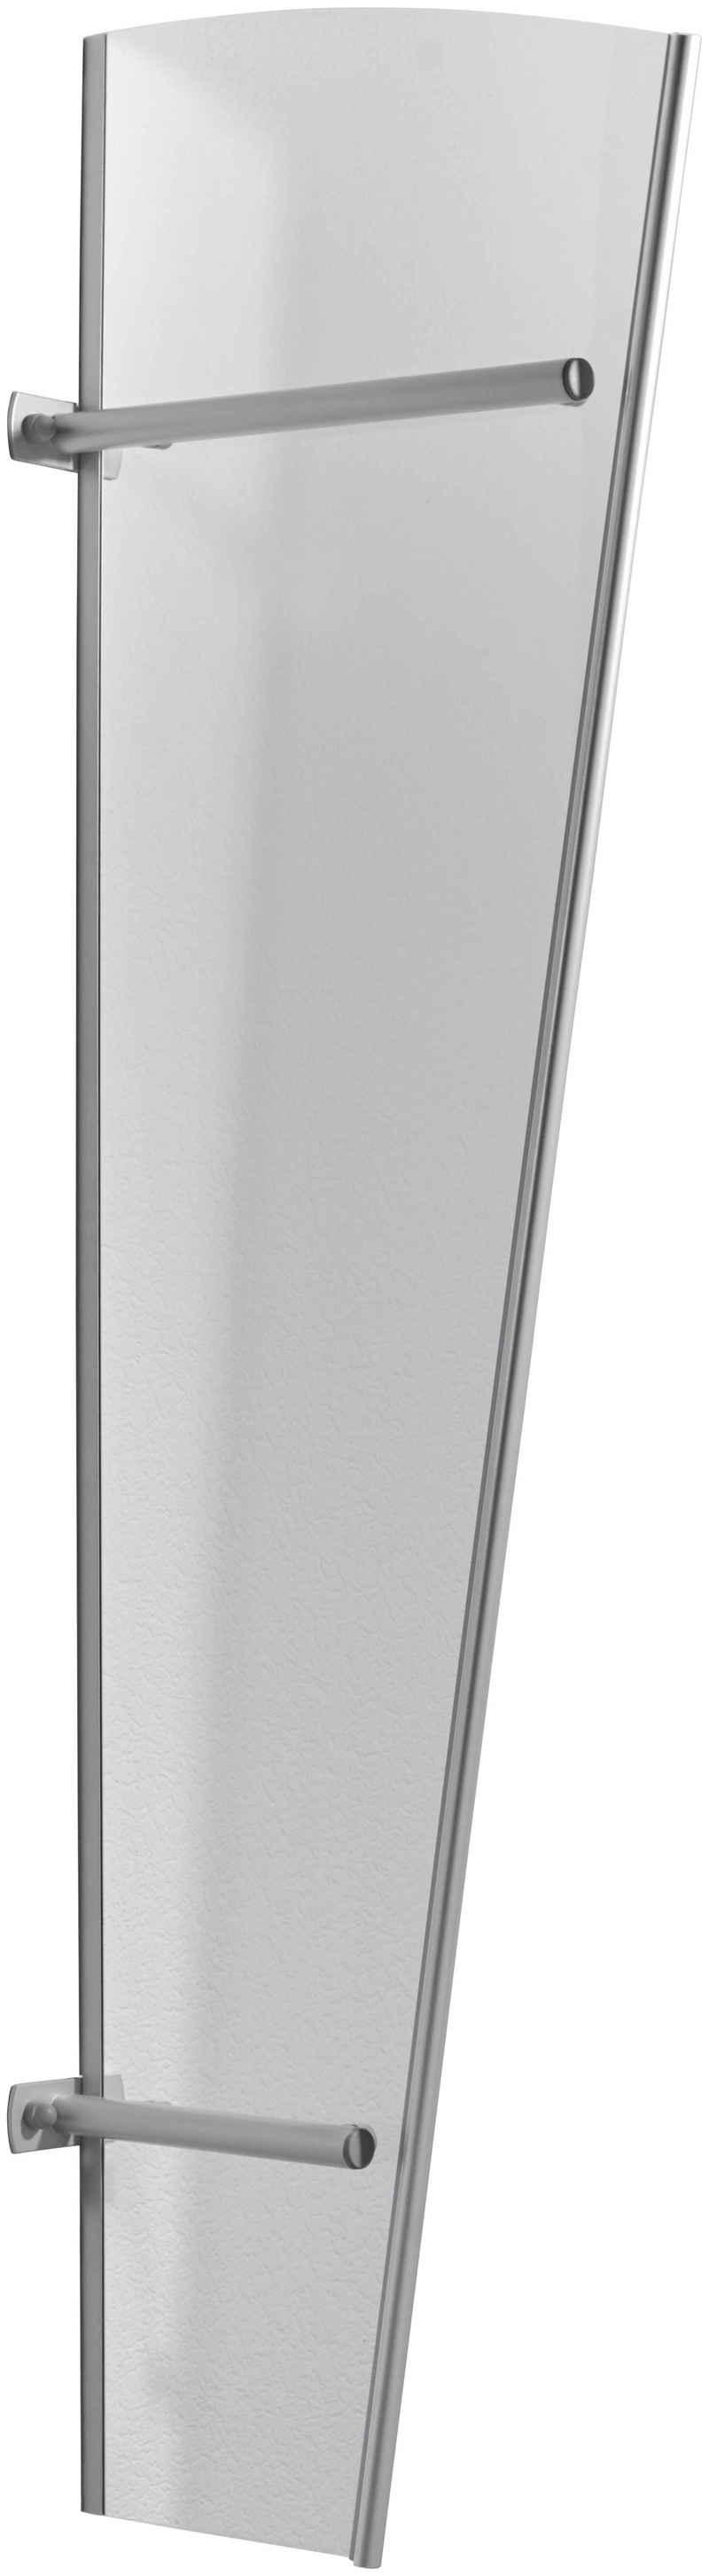 GUTTA Seitenblende »PT/G Acryl«, TxH: 30-60x185 cm